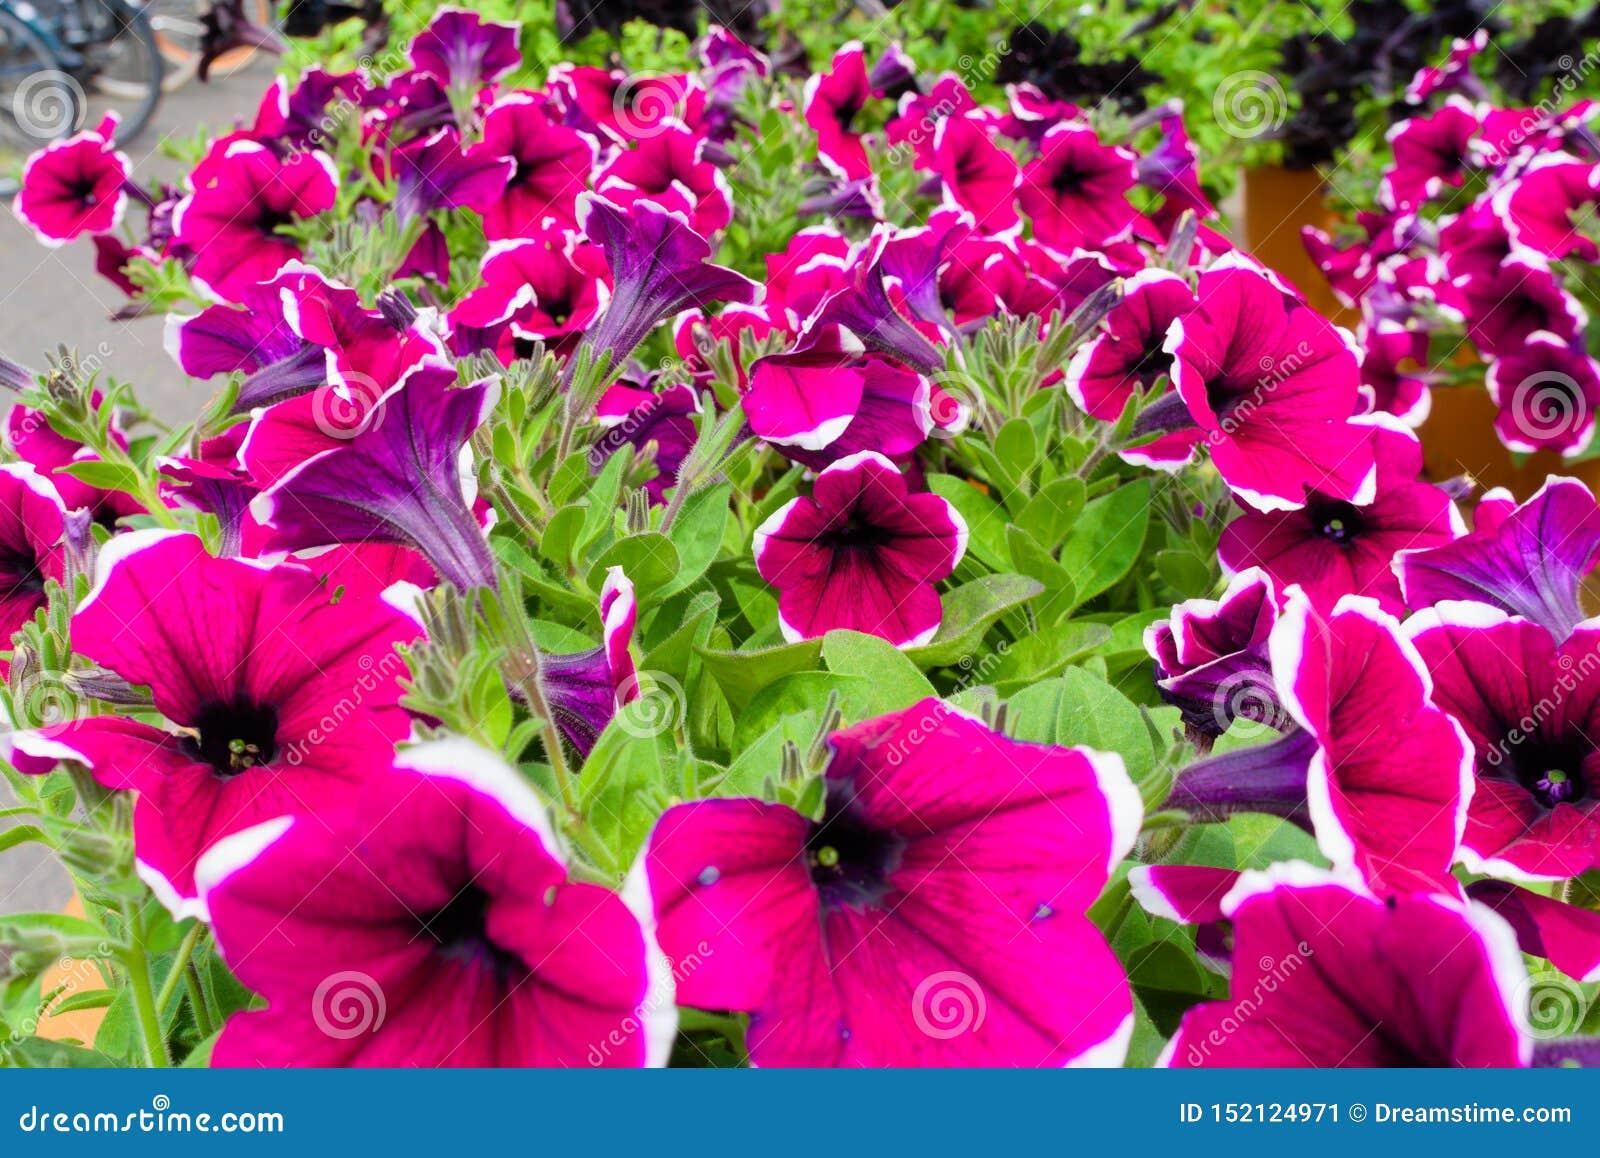 Bella fioritura rosa porpora dei fiori